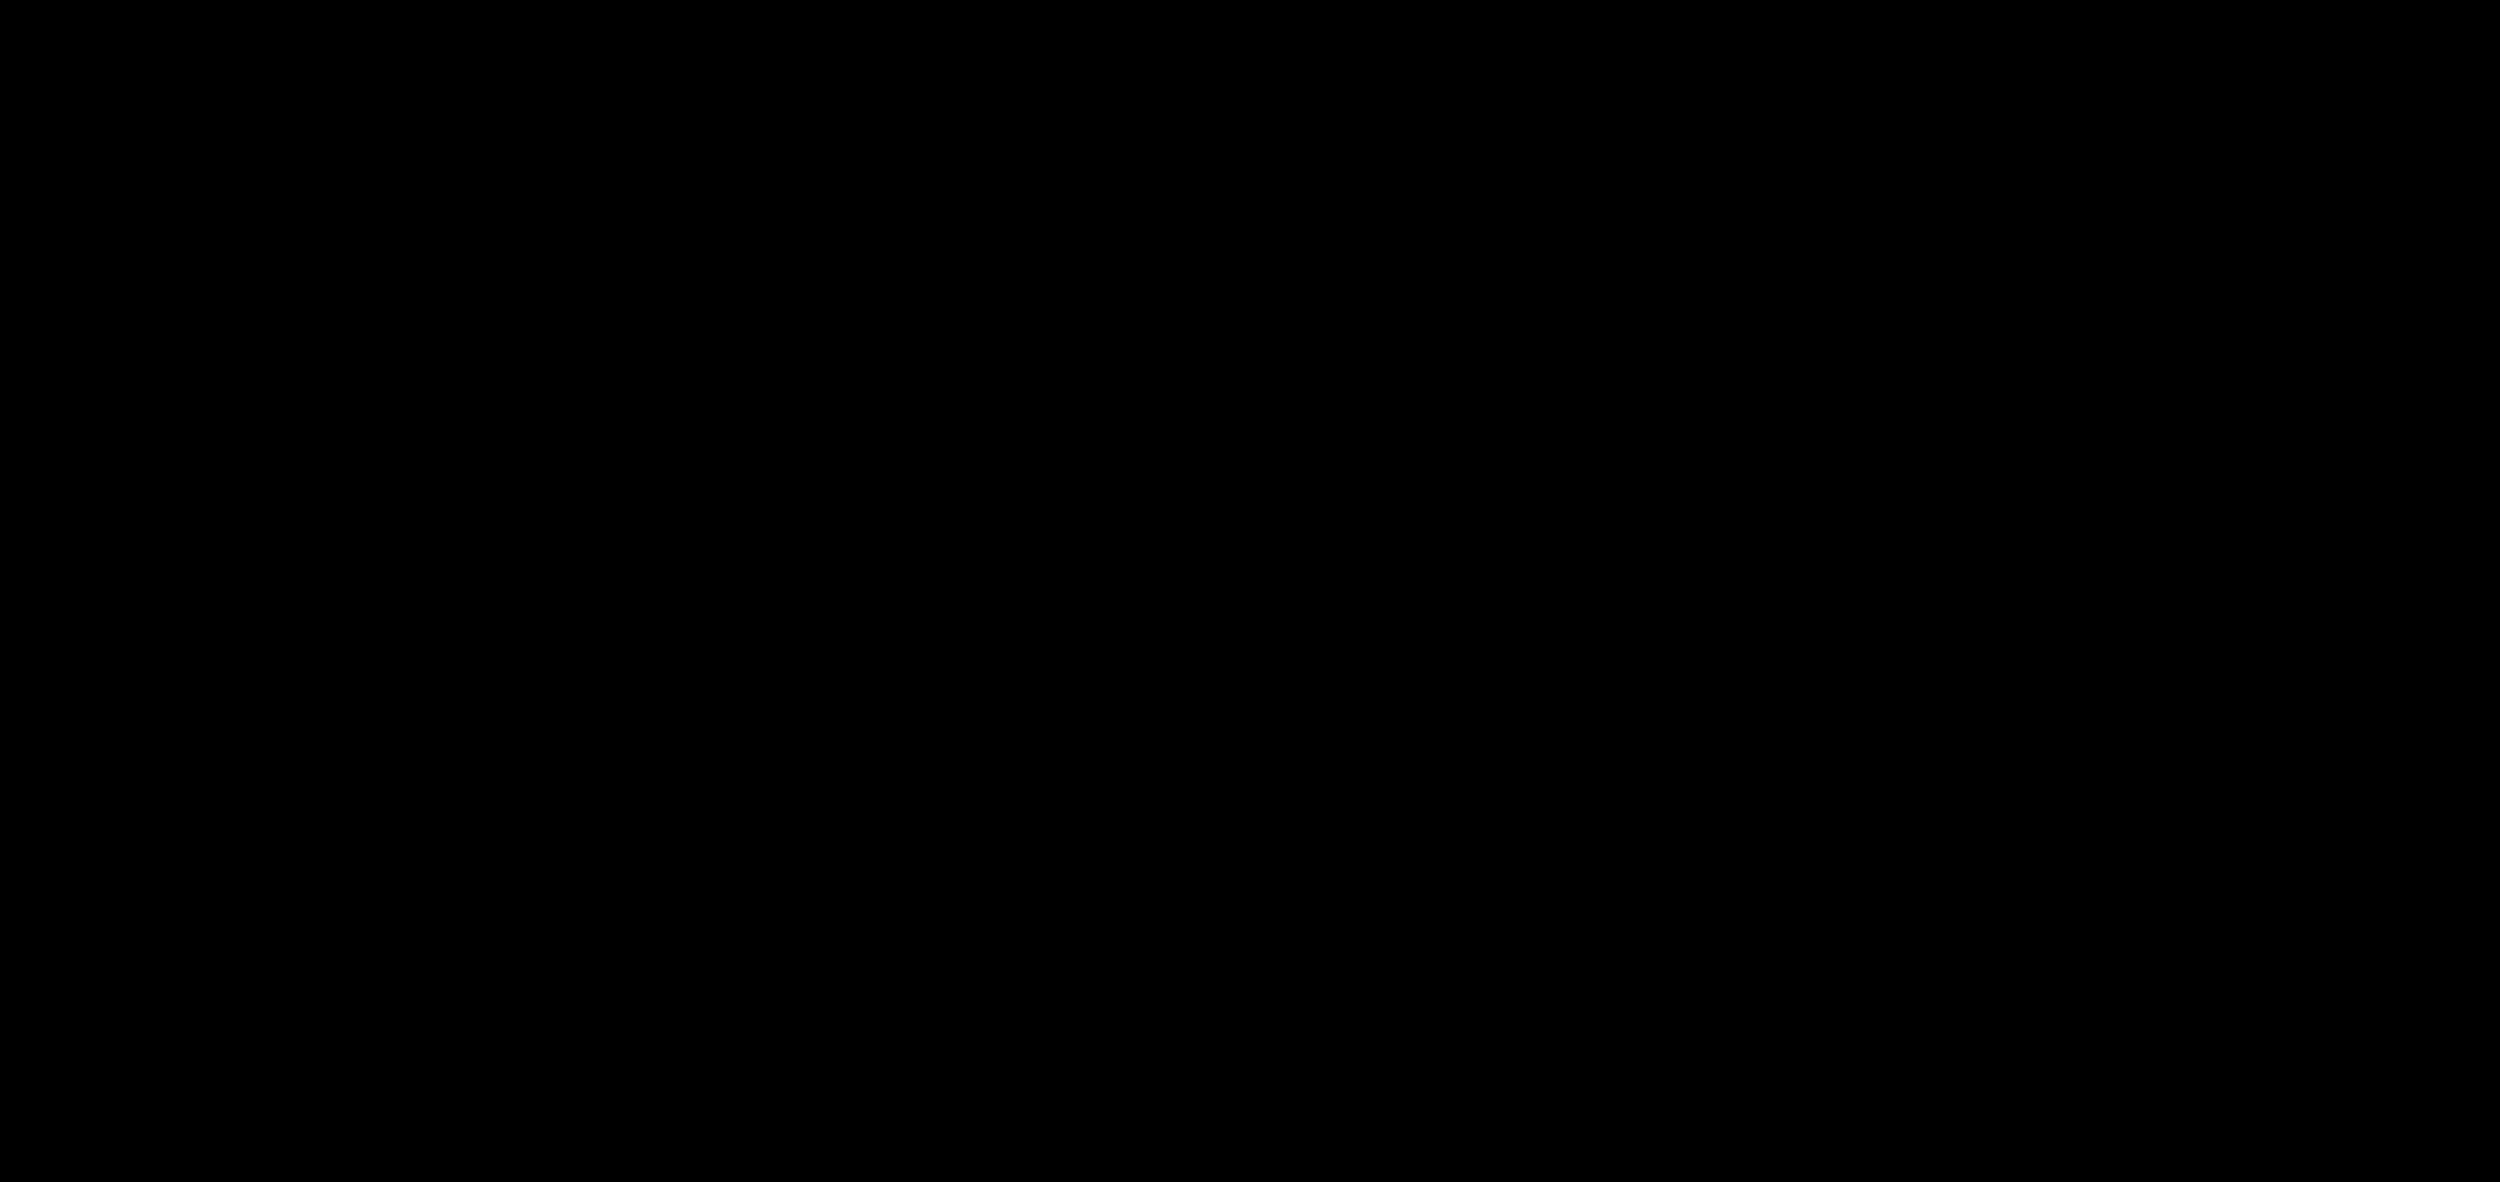 LOGO-ENCANTADA- BLACK.png